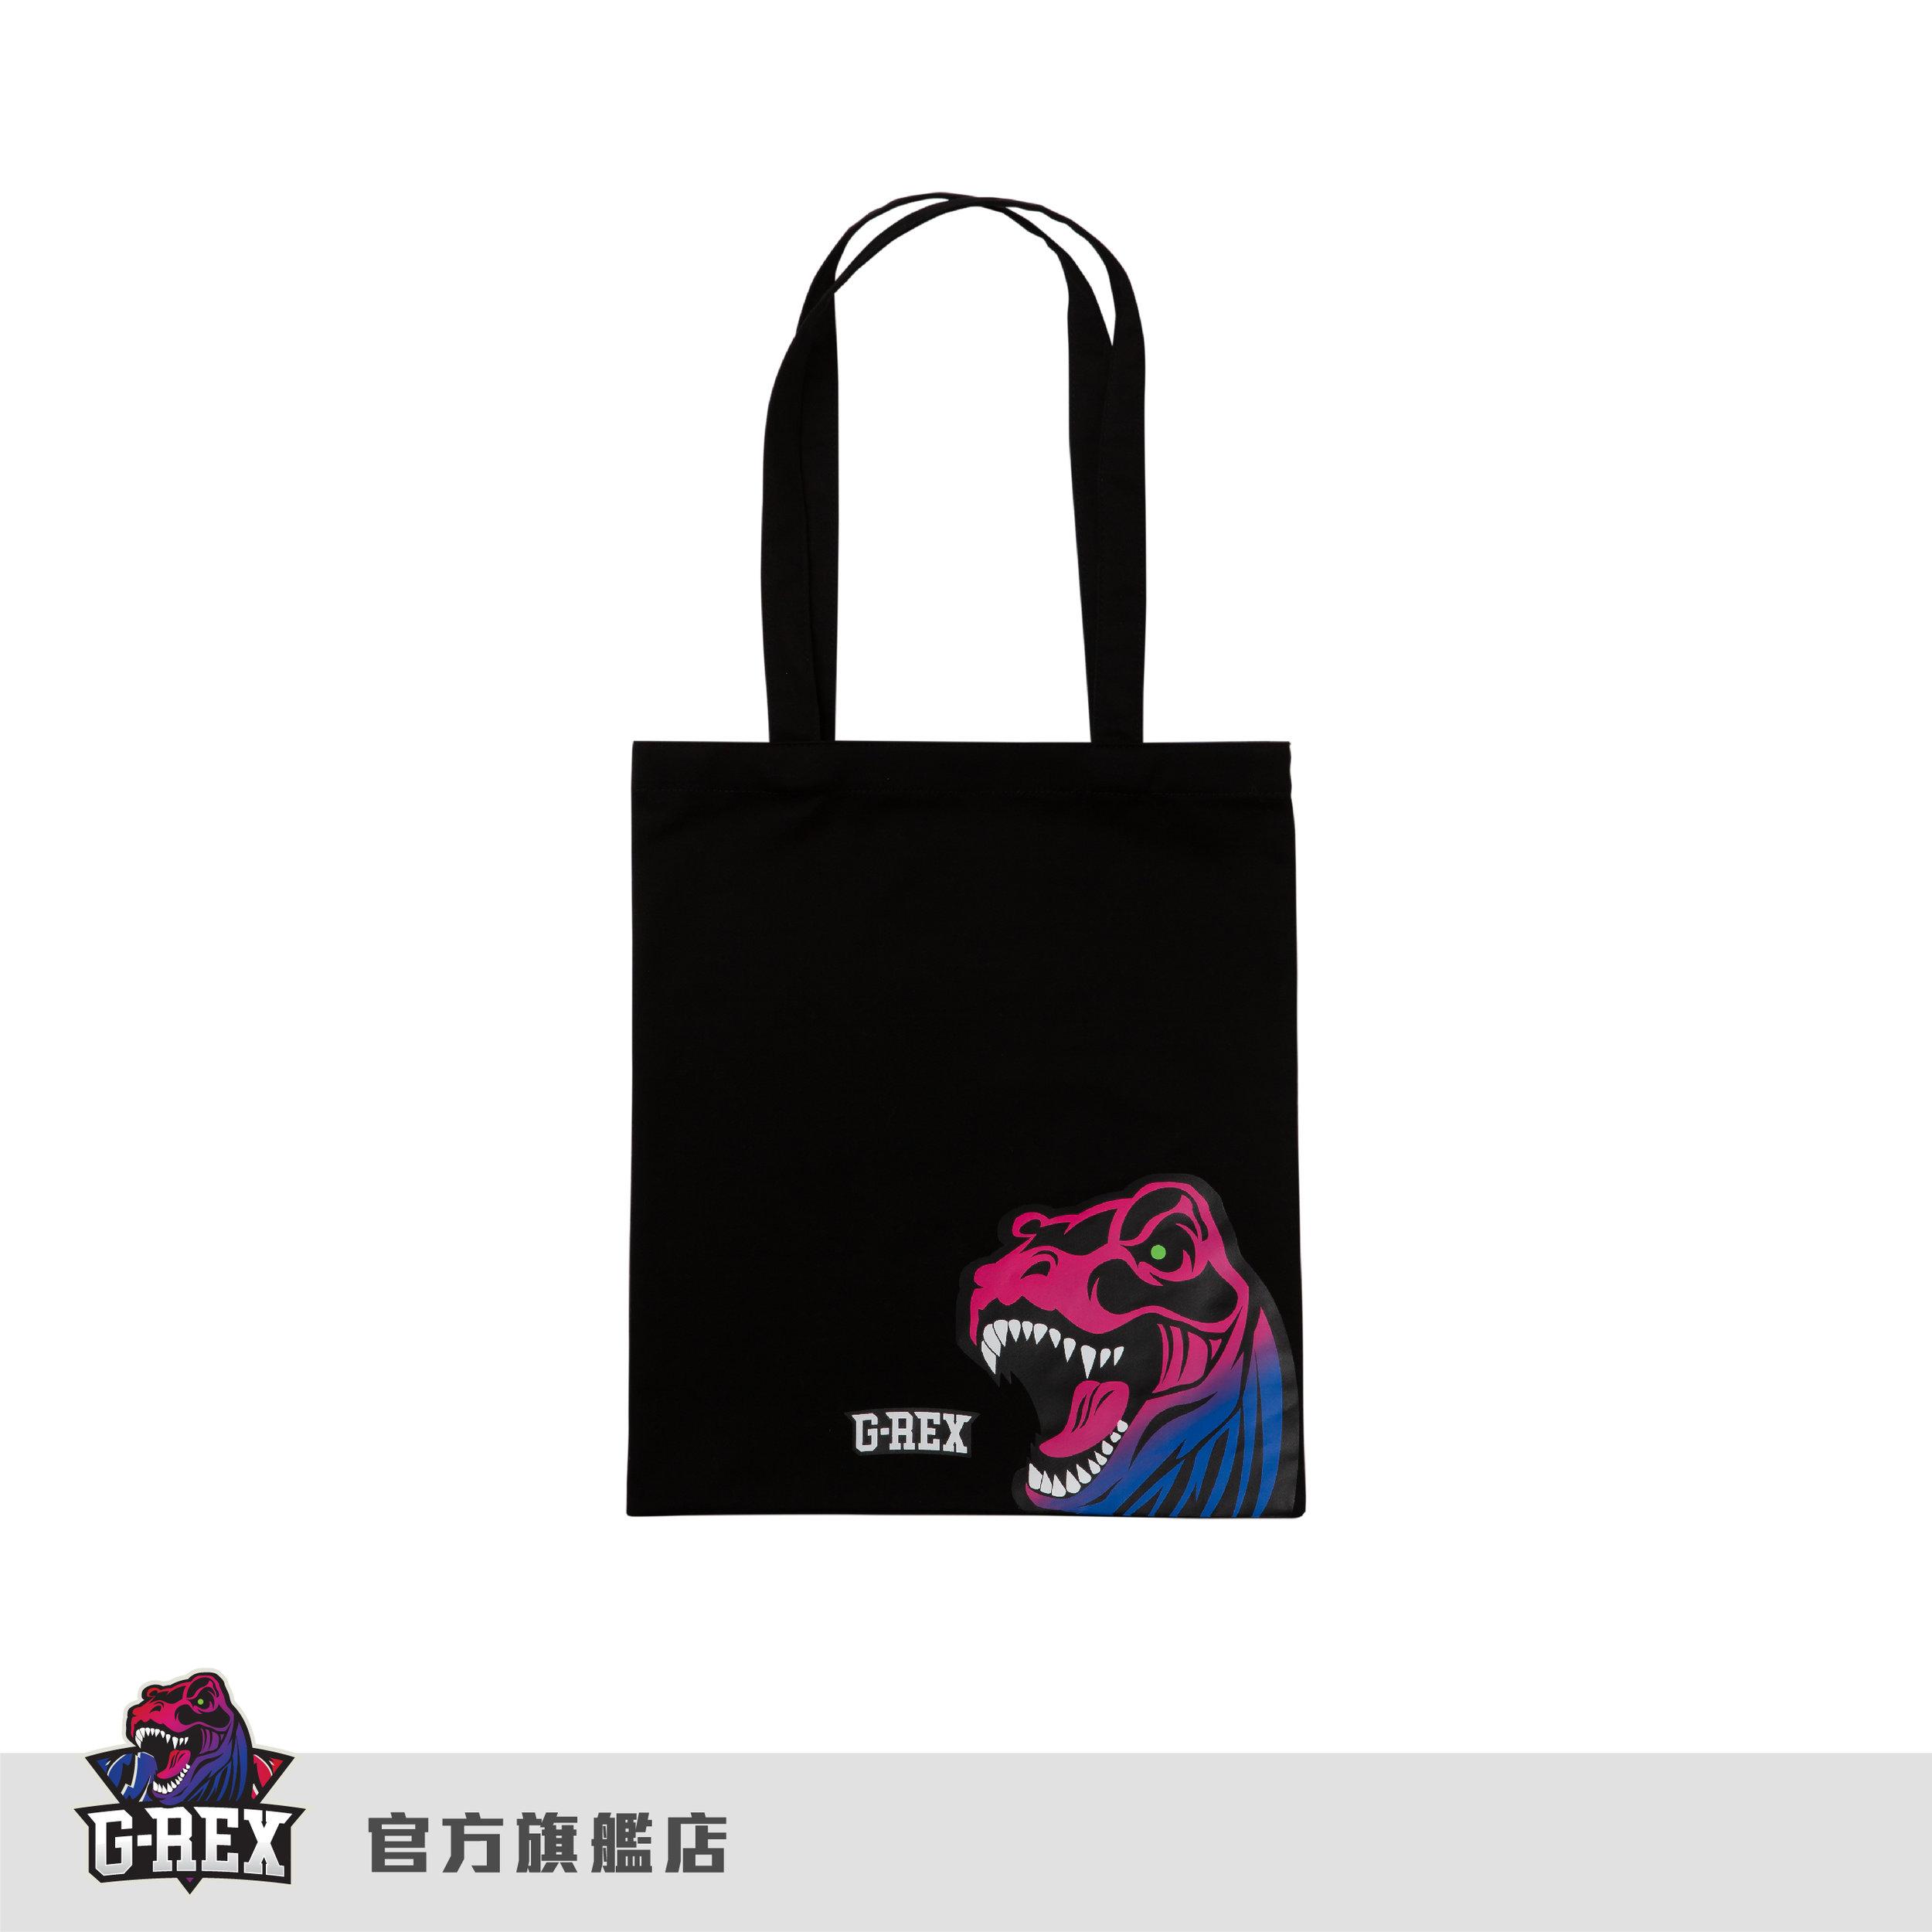 shopee_product_0121-04.jpg